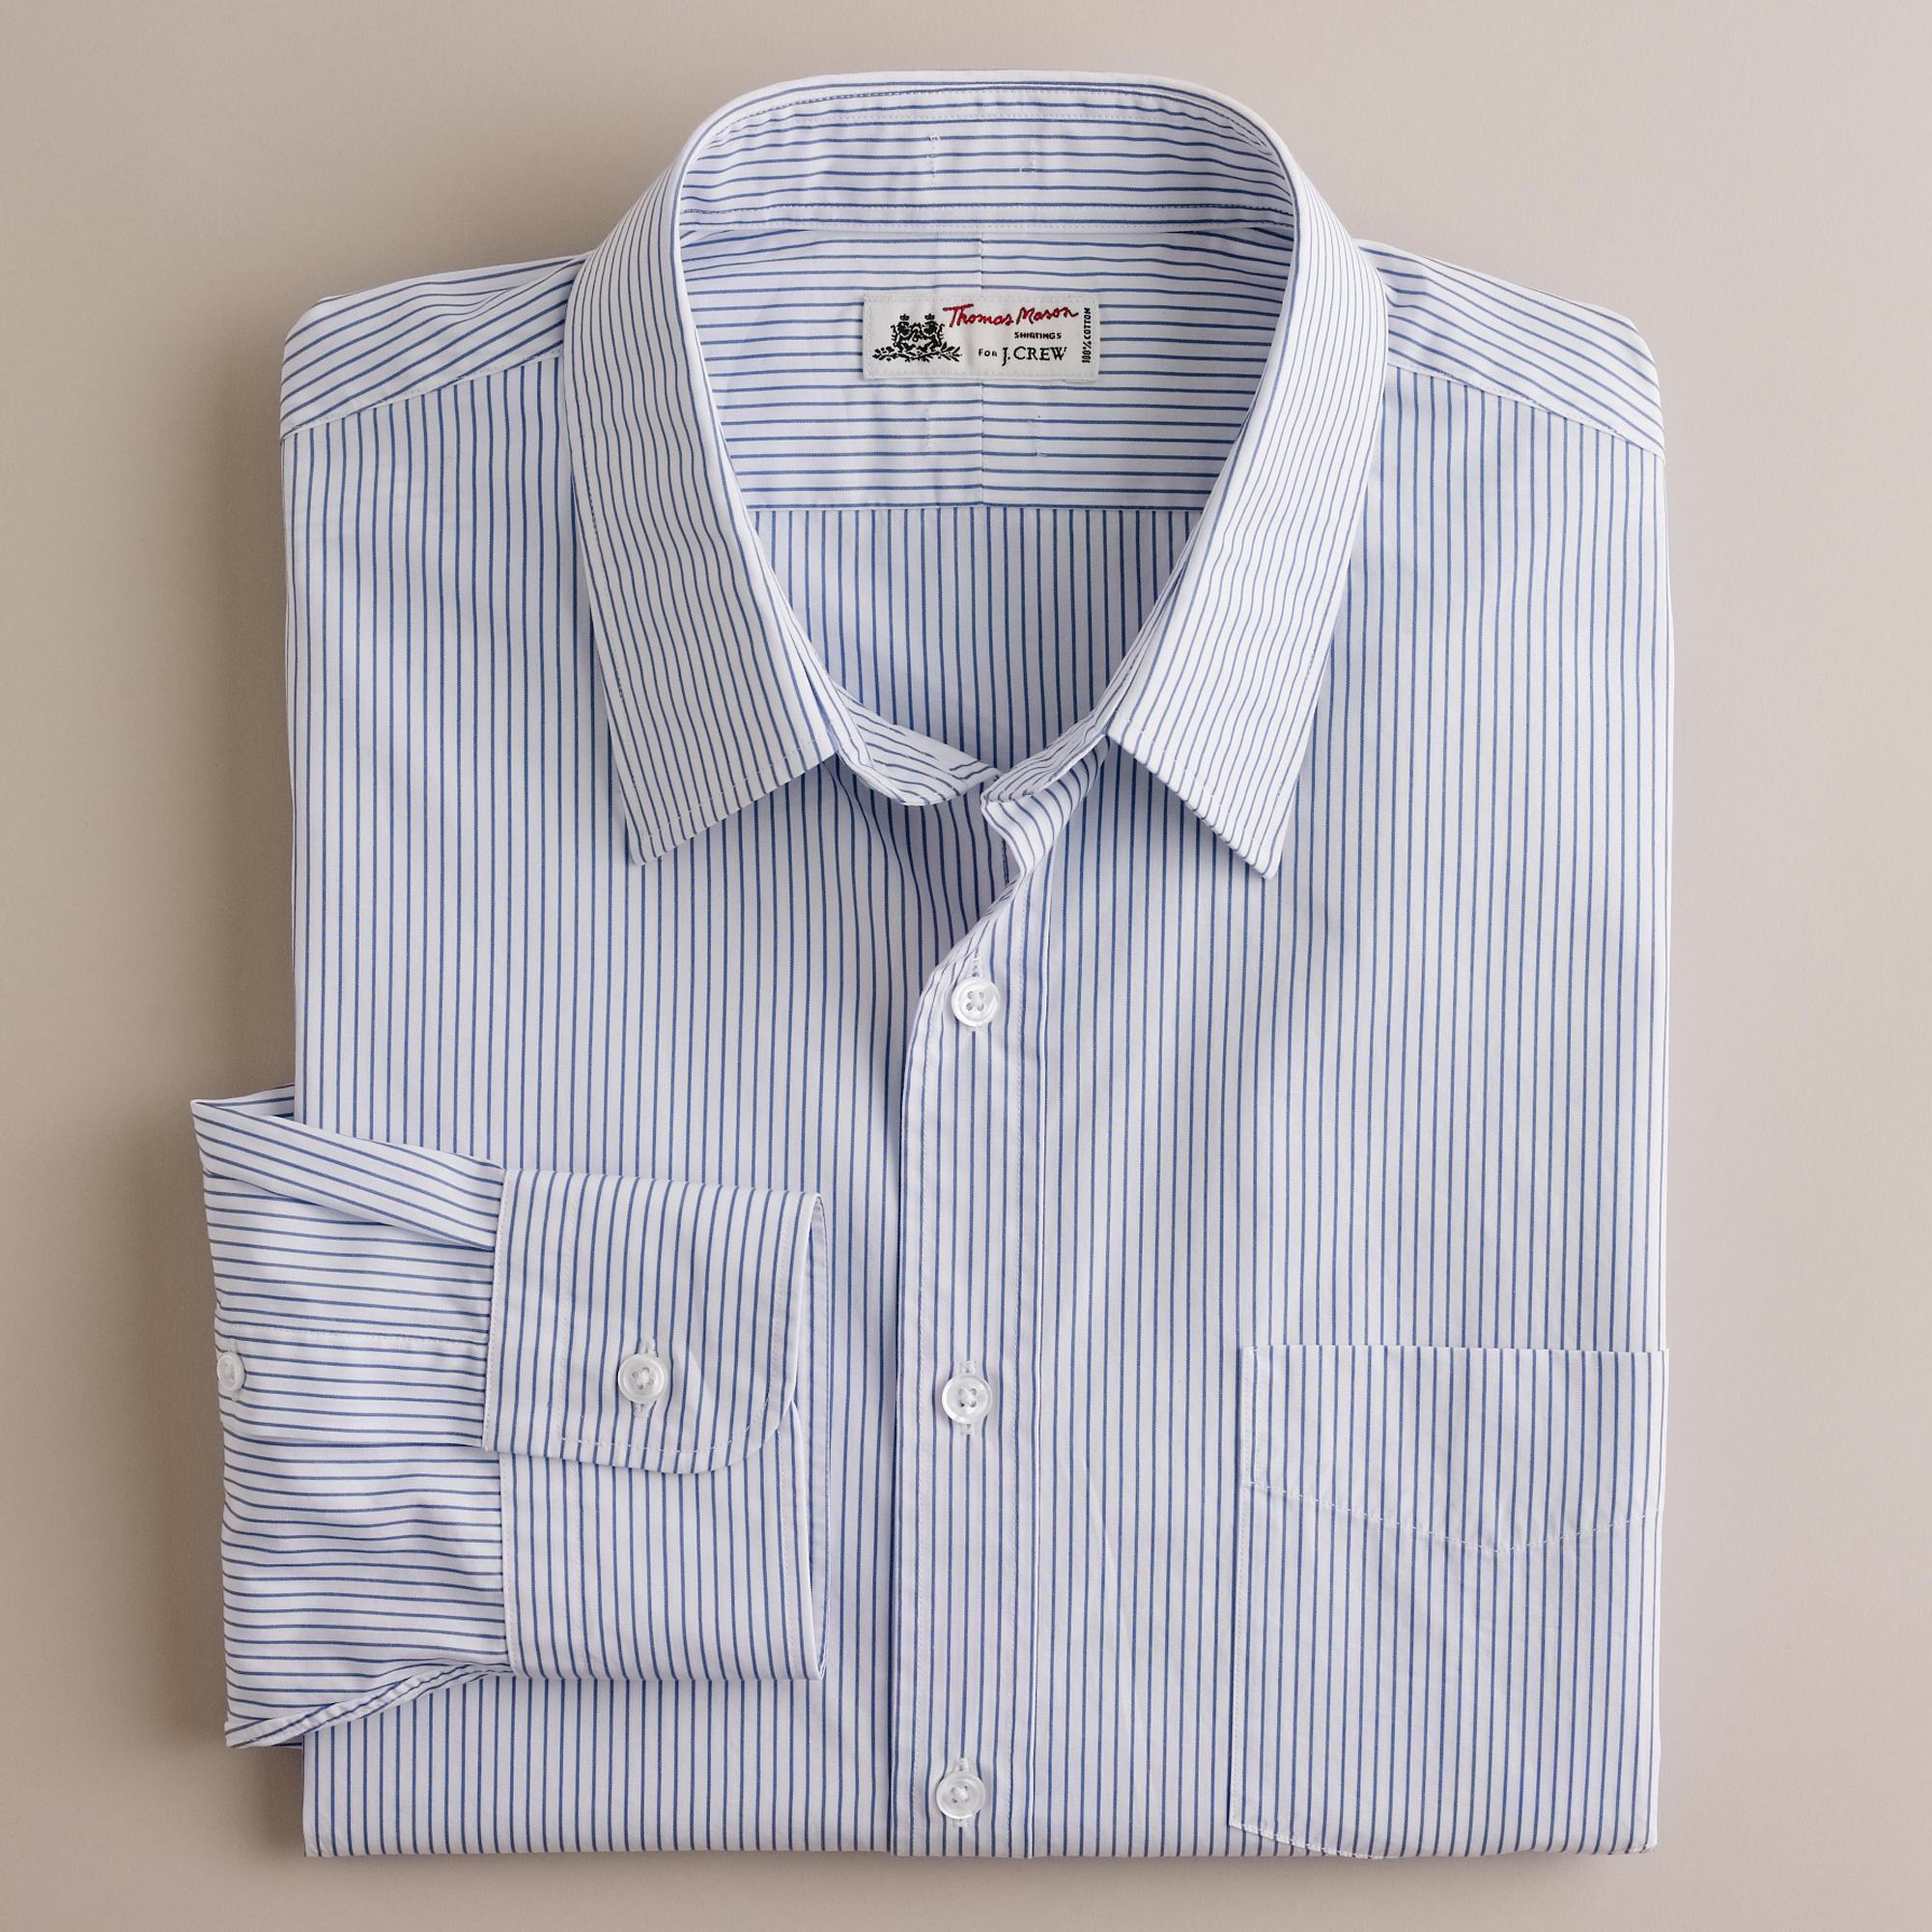 Thomas mason fabric point collar dress shirt in bengal for Thomas mason dress shirts